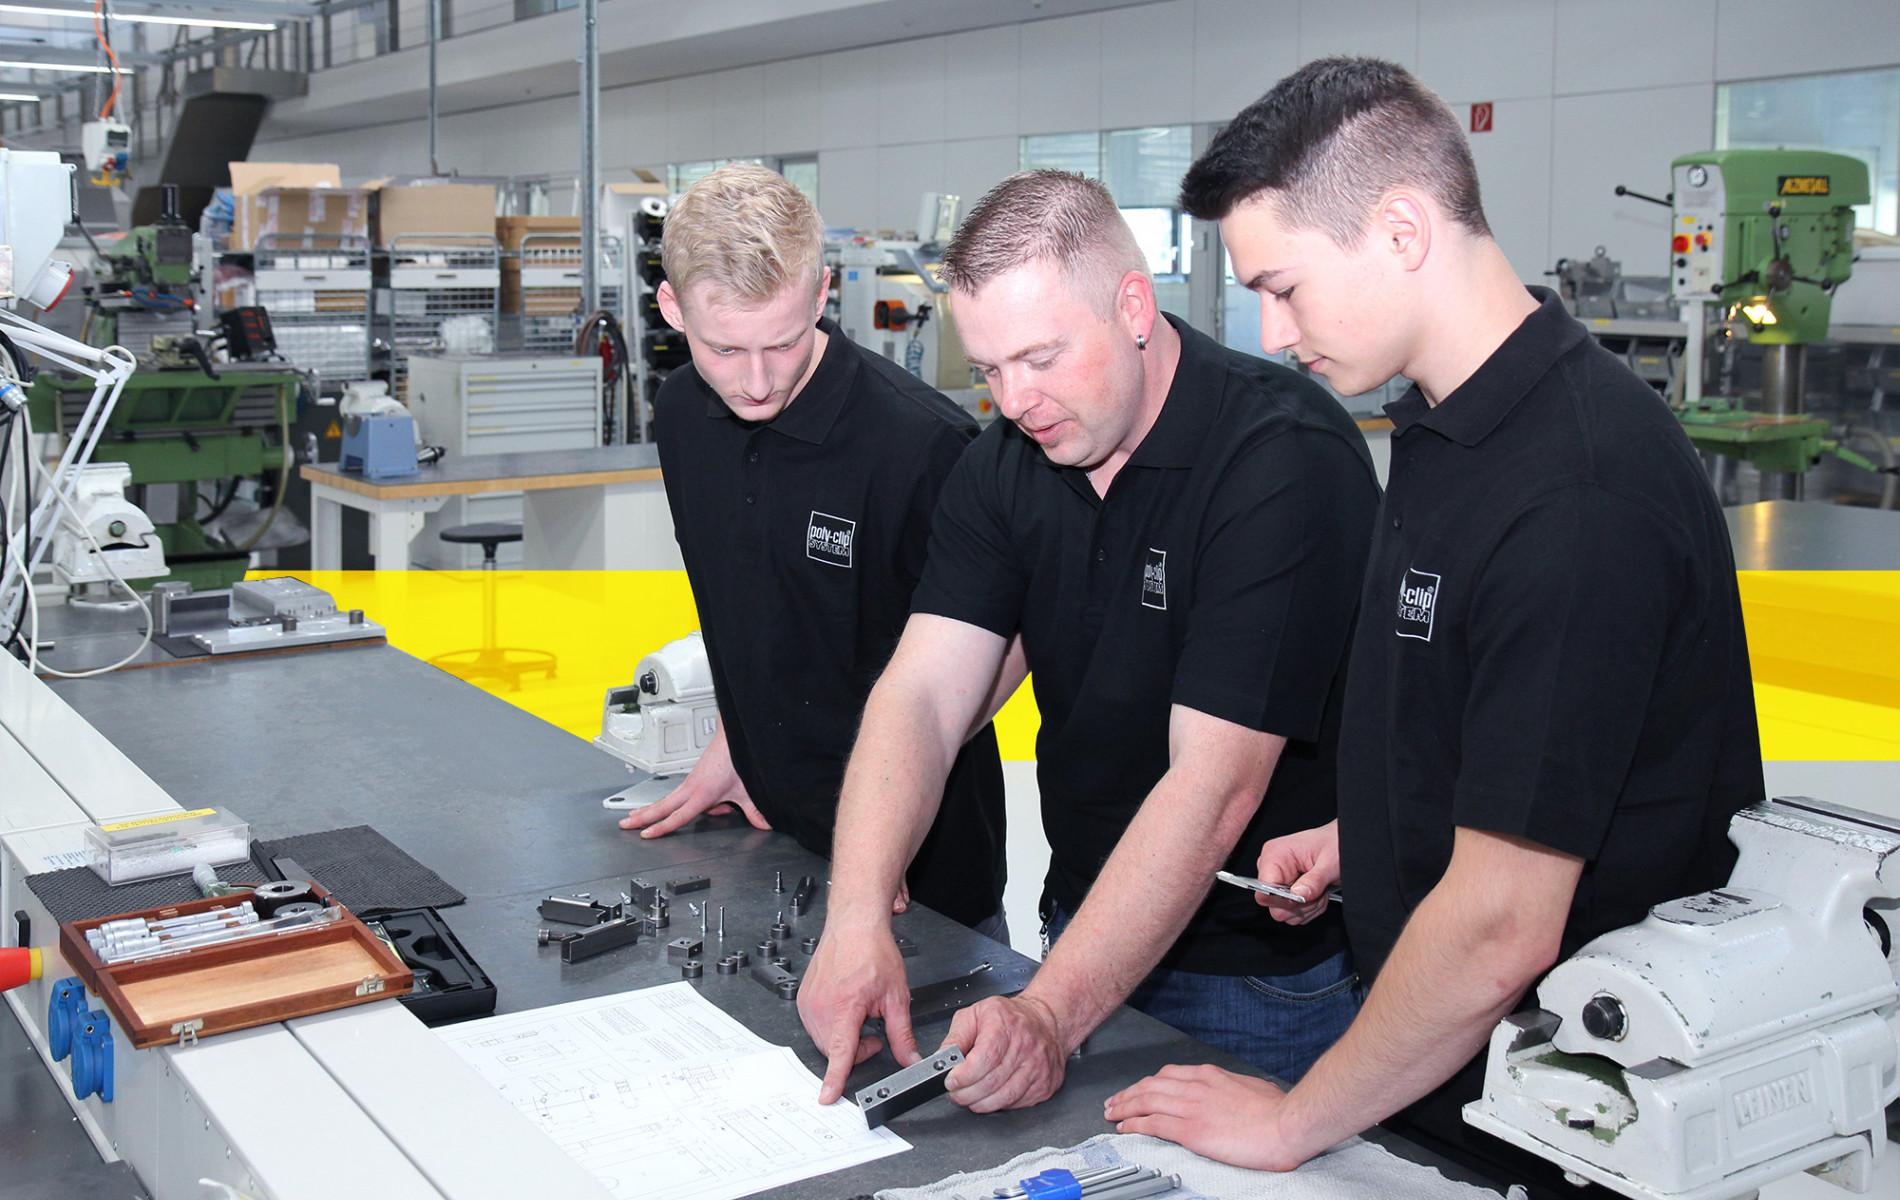 three employees working